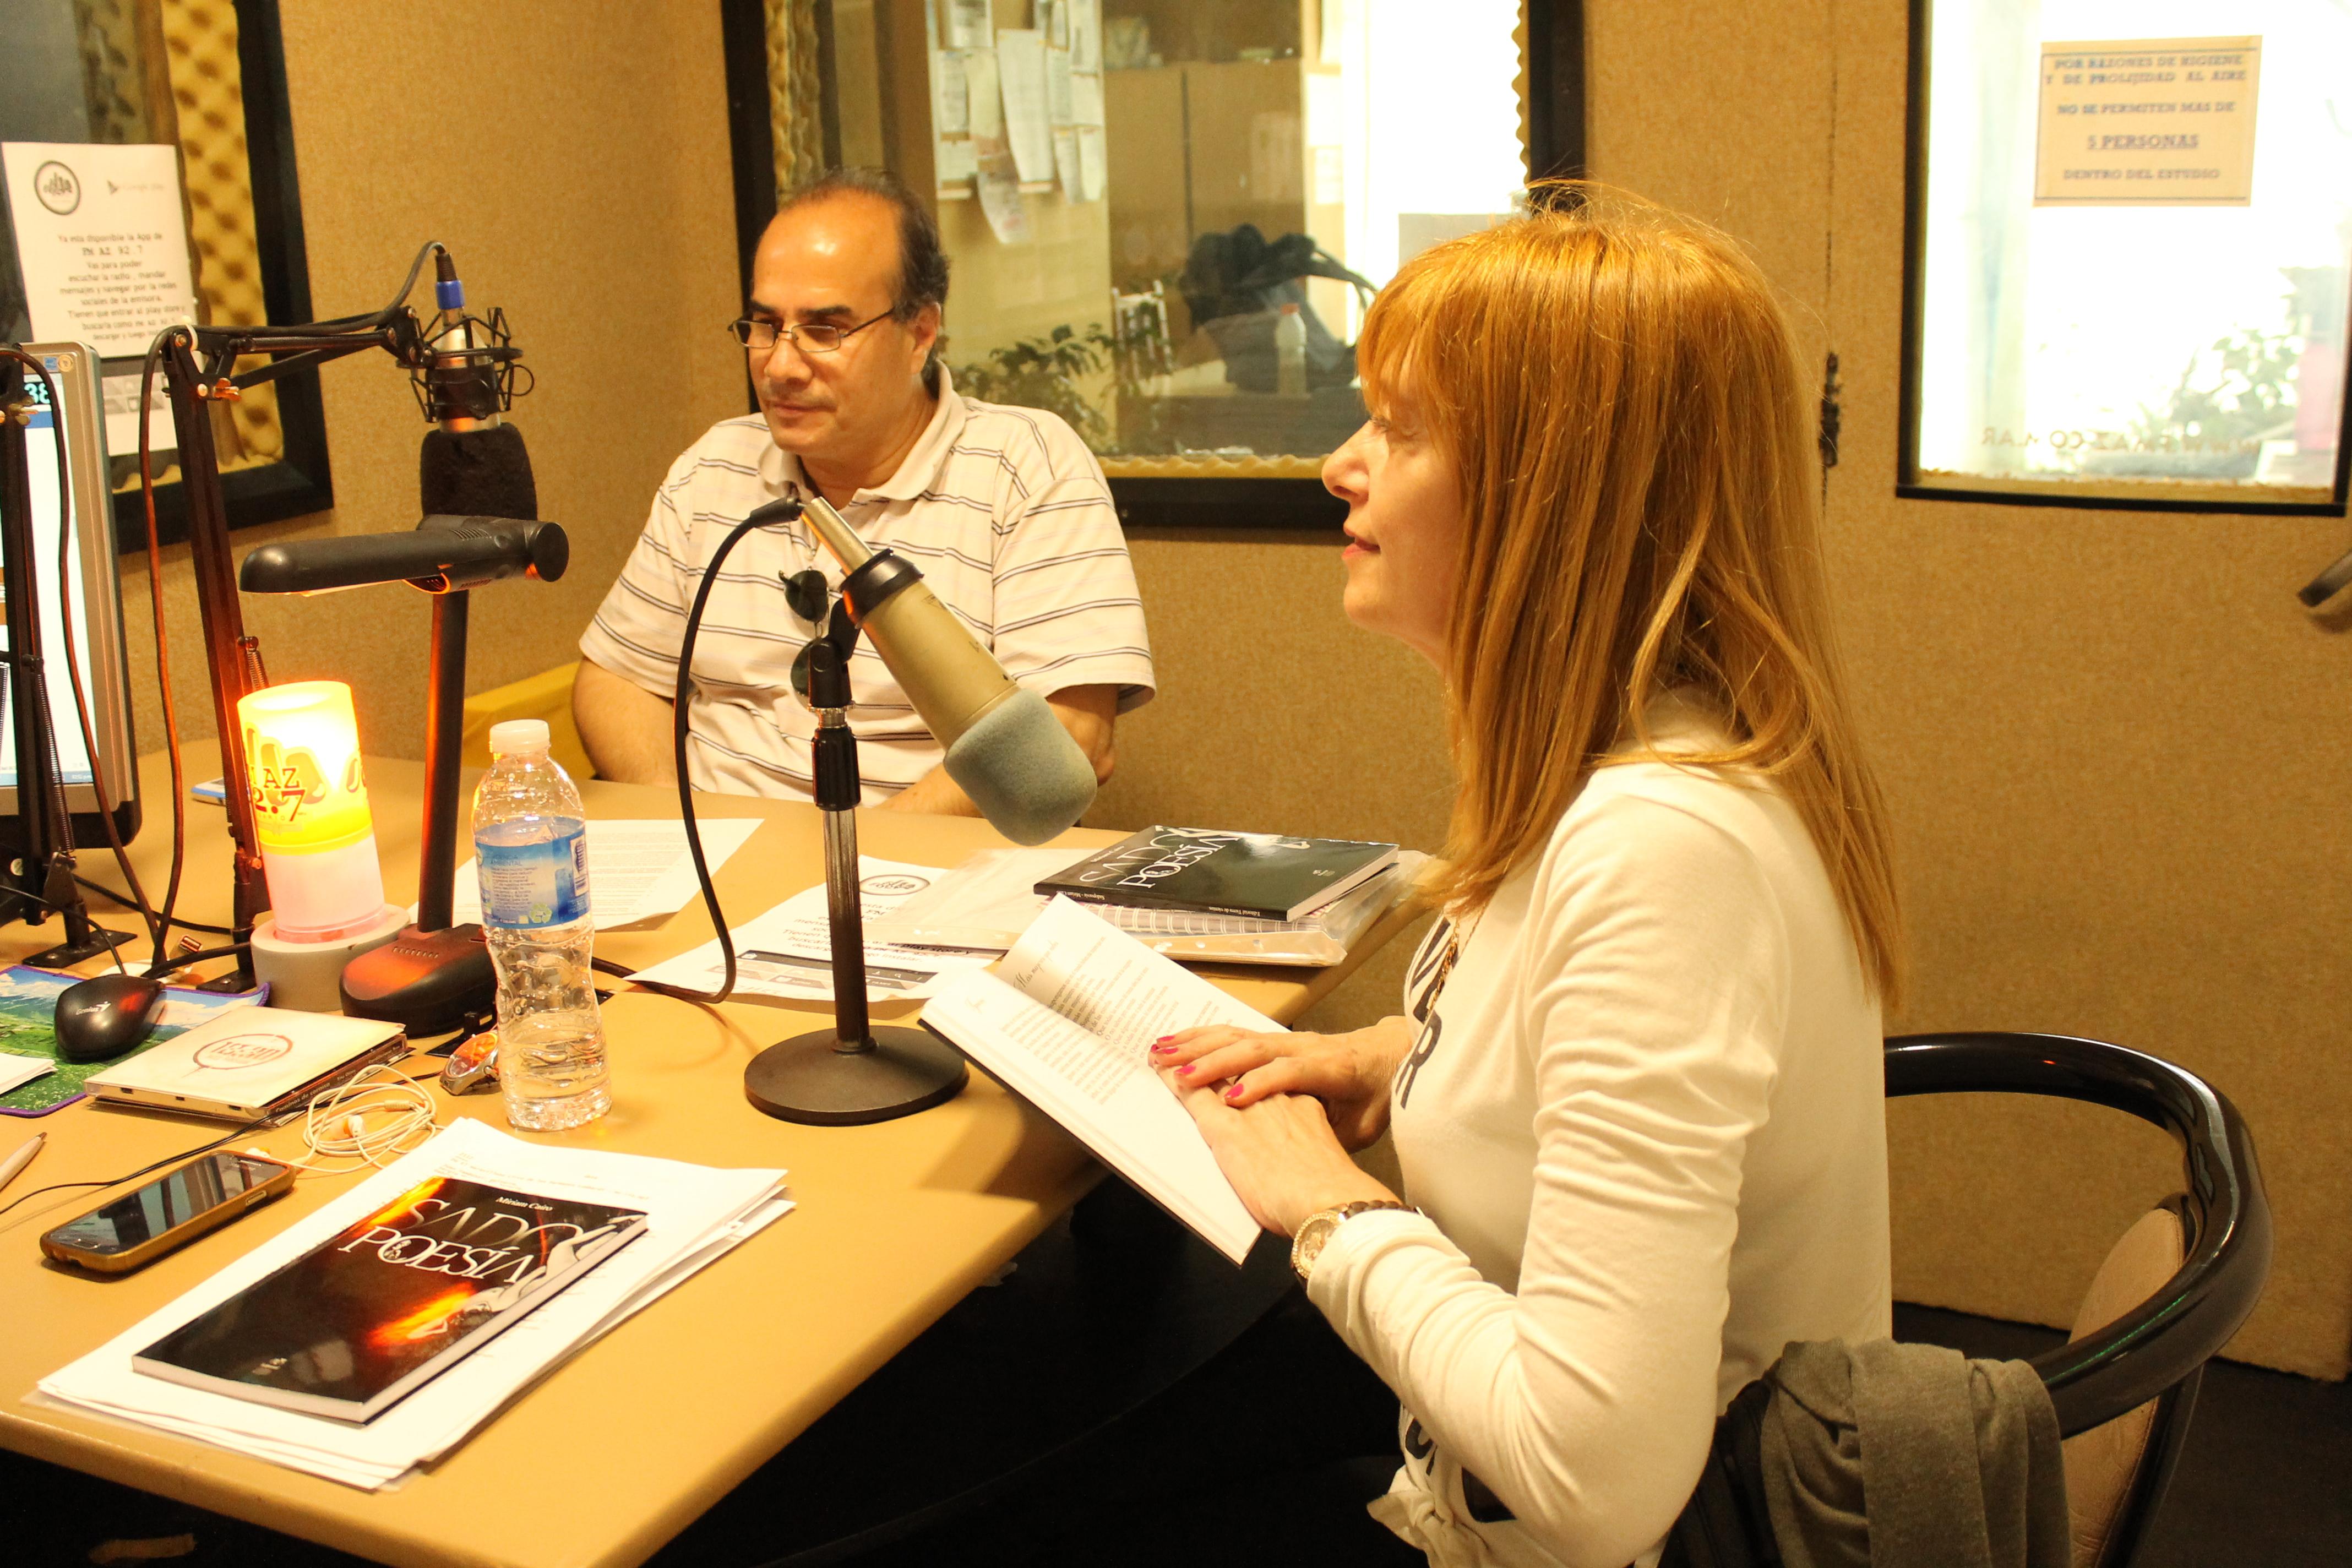 Raúl Astorga y Miriam Cairo